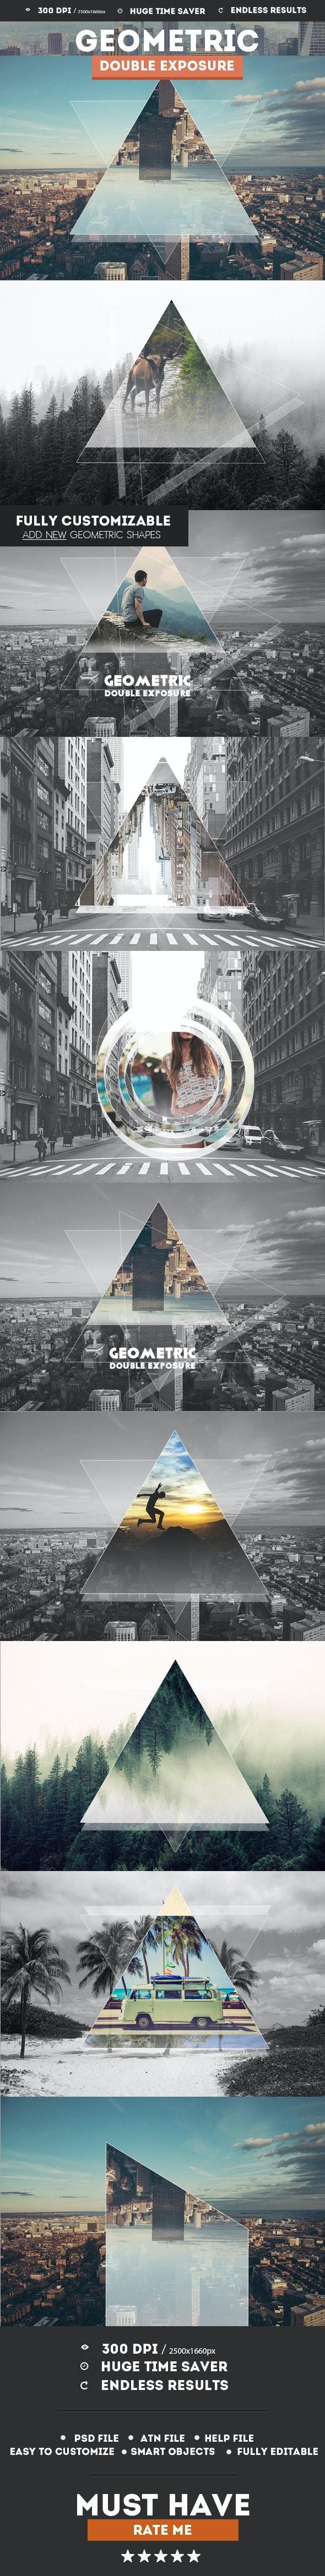 Geometric Double Exposure Photoshop Creator - Photo Effects Actions